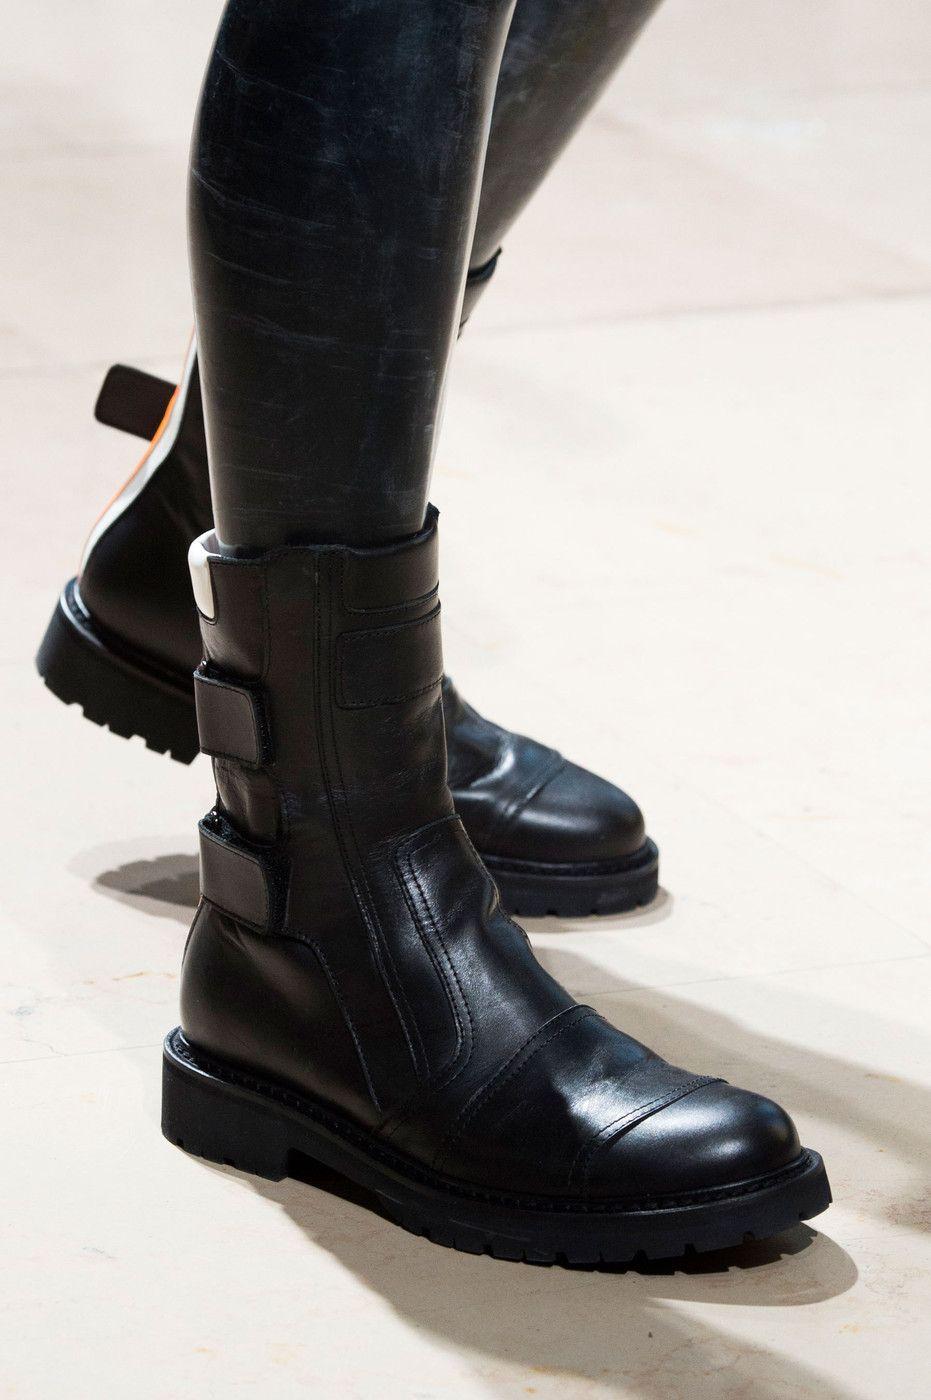 A.F. Vandevorst at Paris Fashion Week